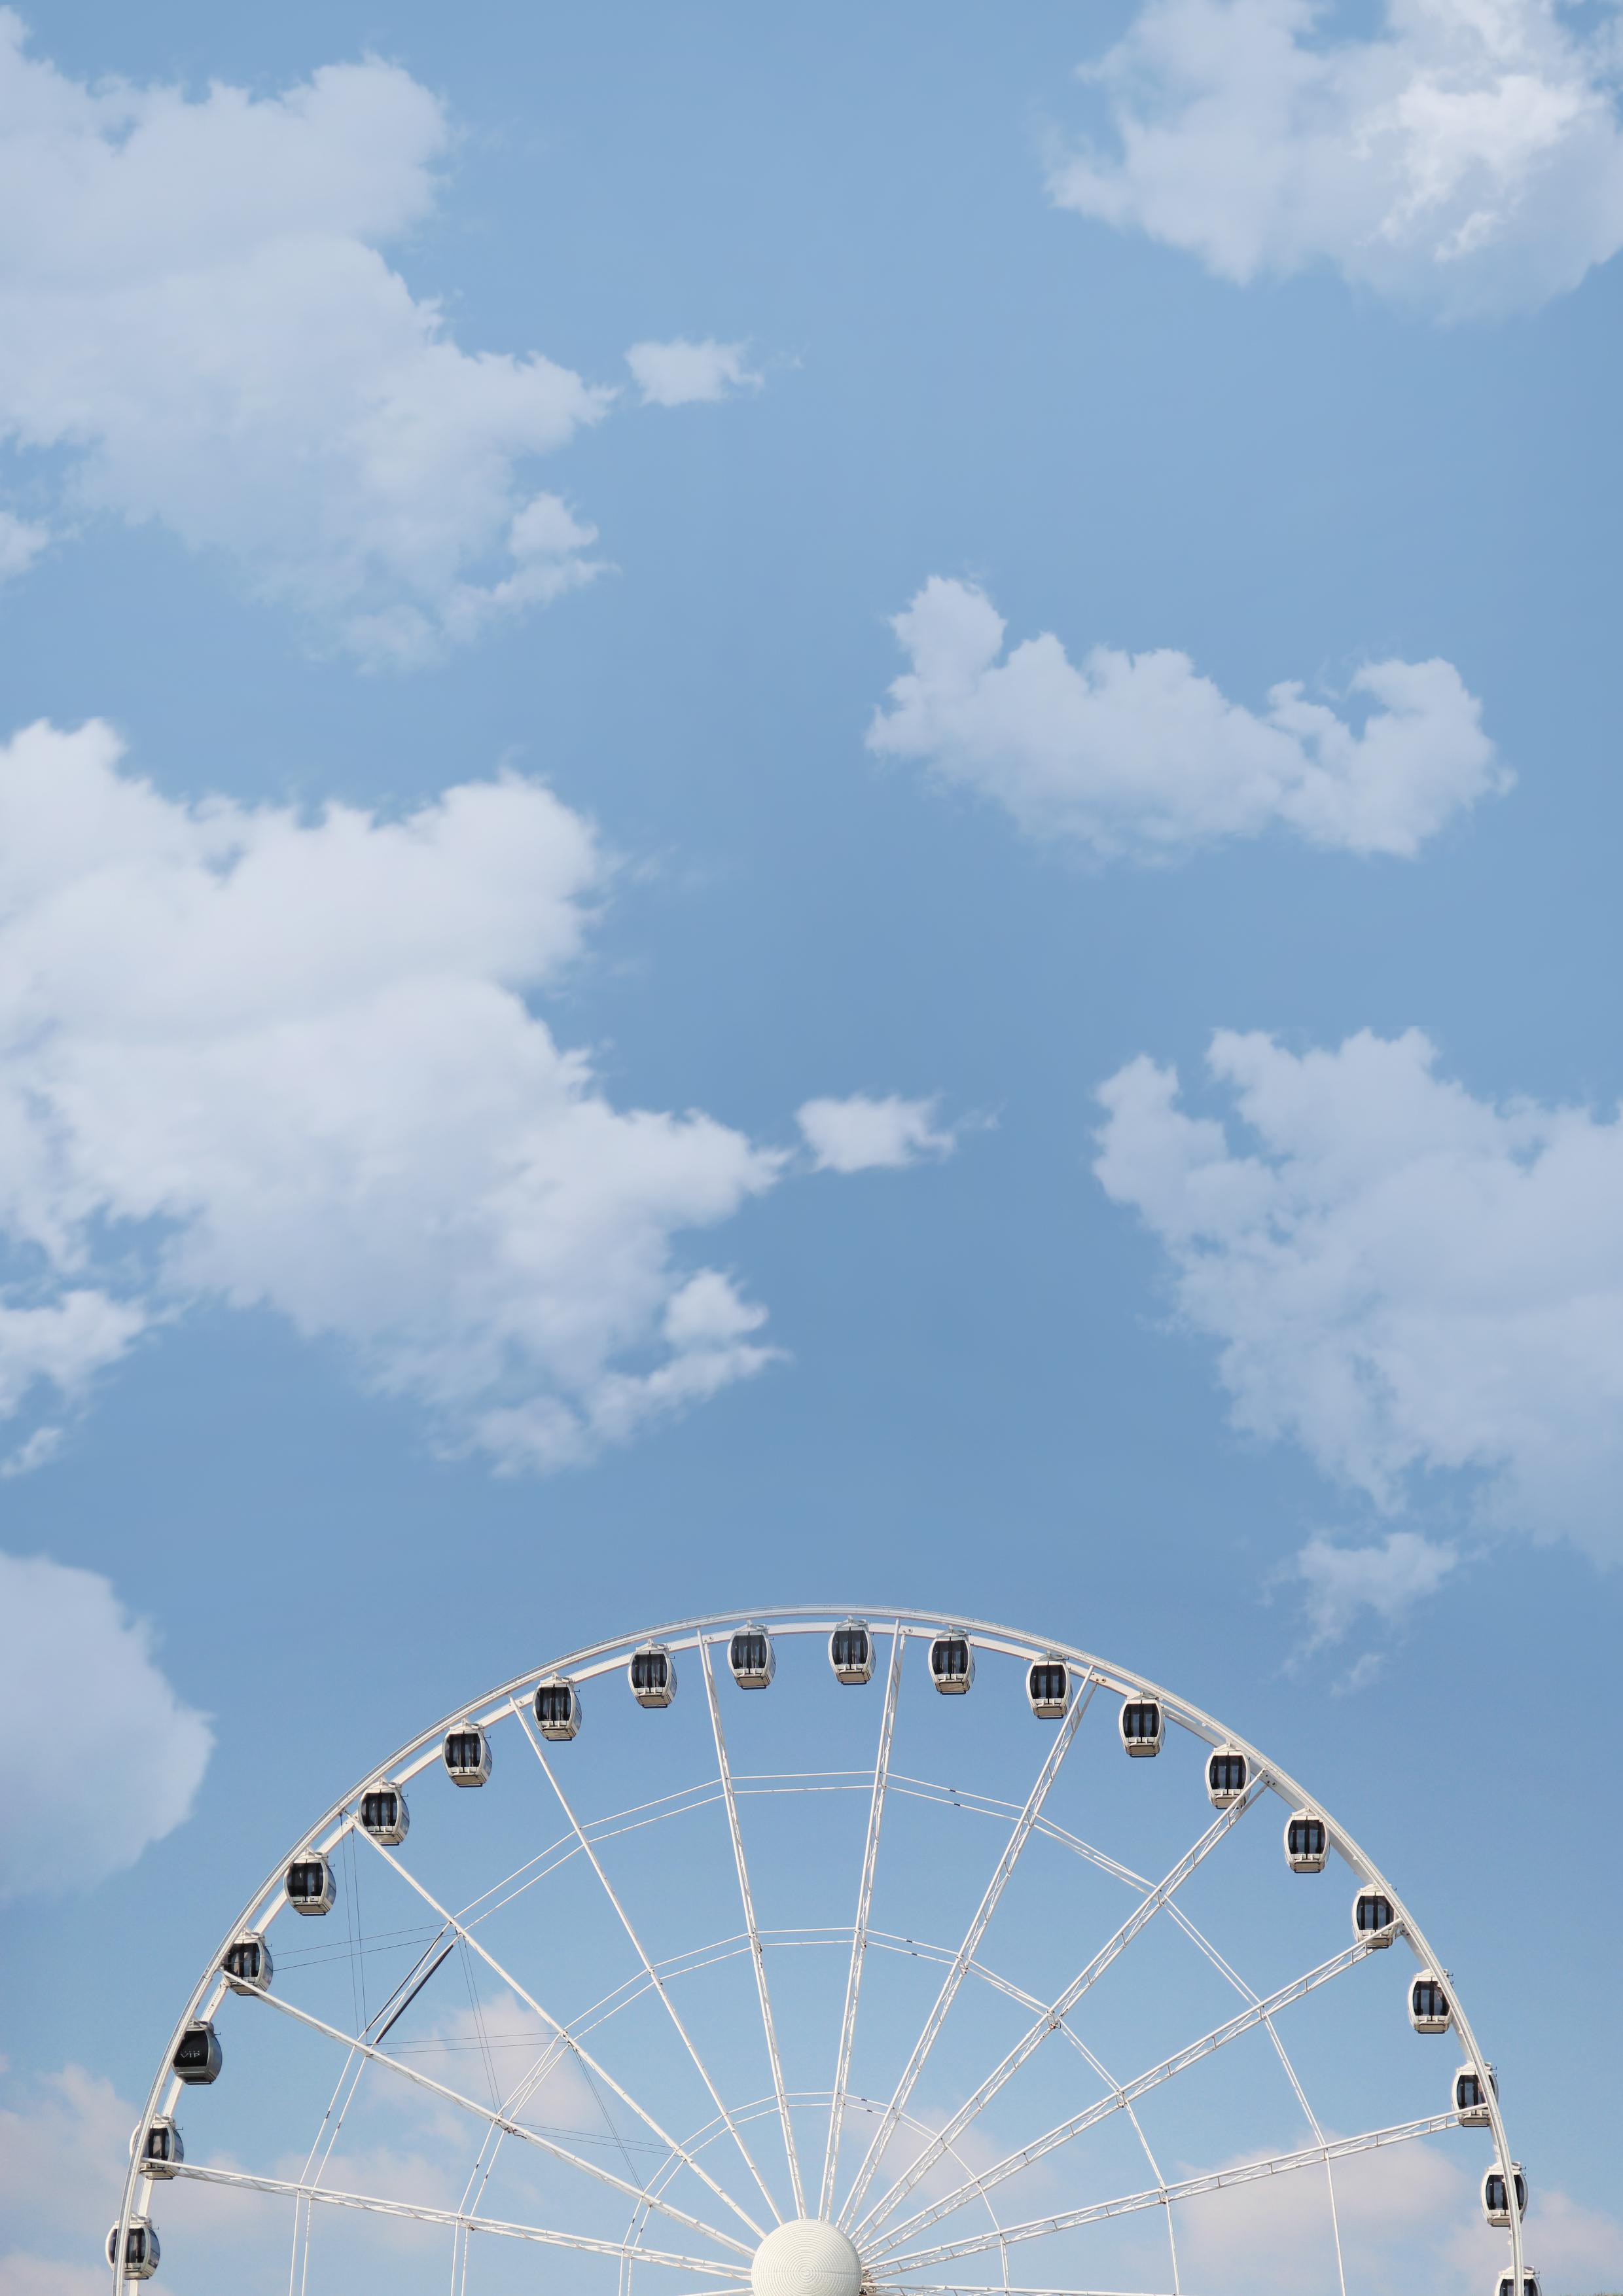 photo of white ferris wheel under white cloudy blue sky